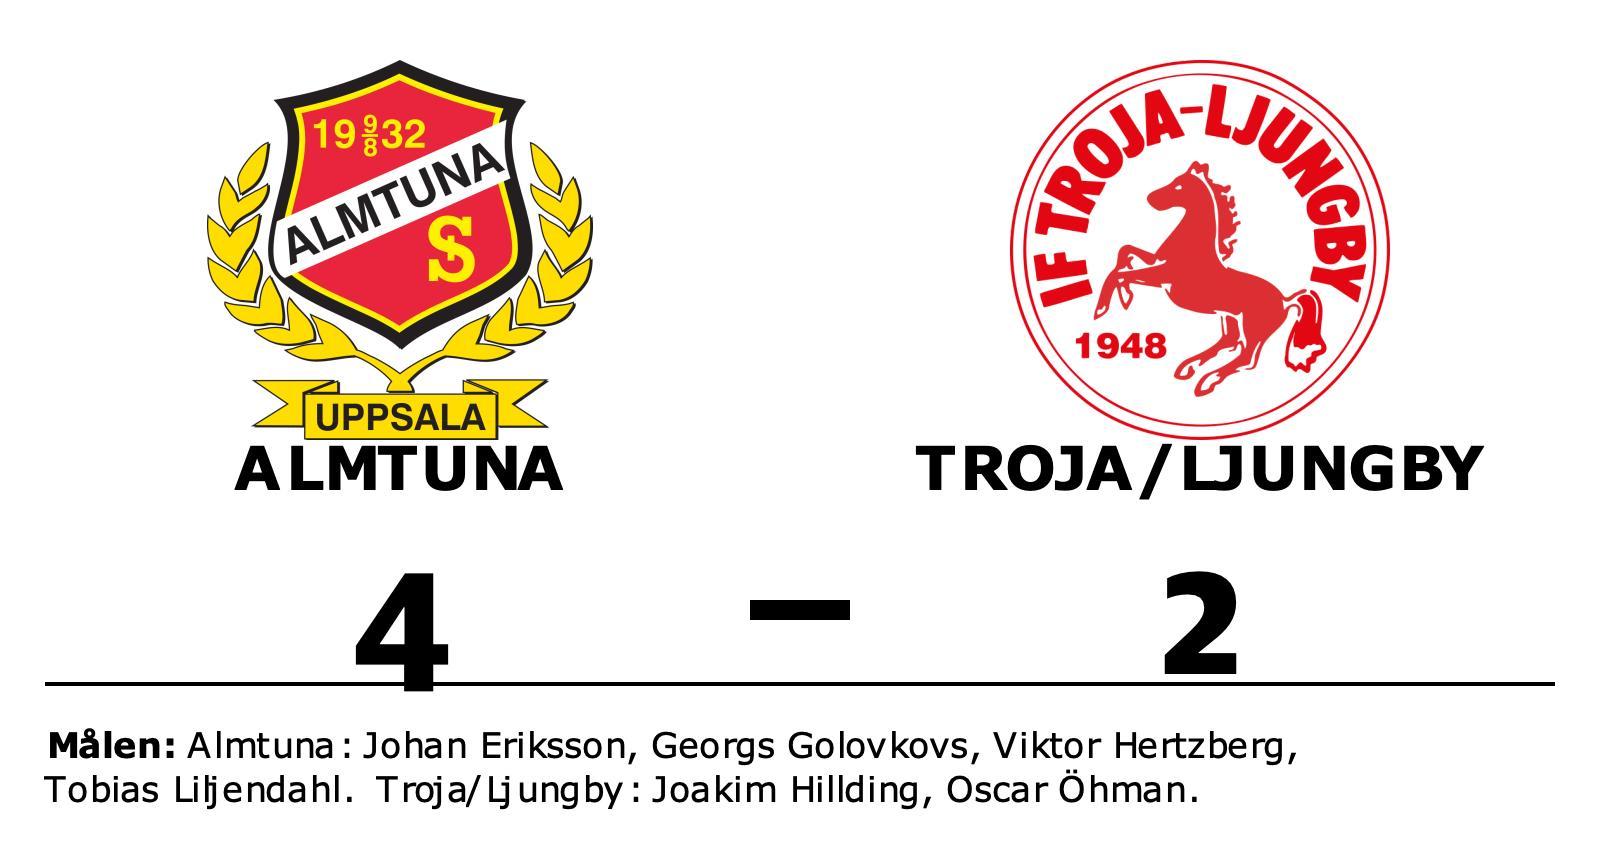 Almtuna slog Troja/Ljungby på hemmaplan